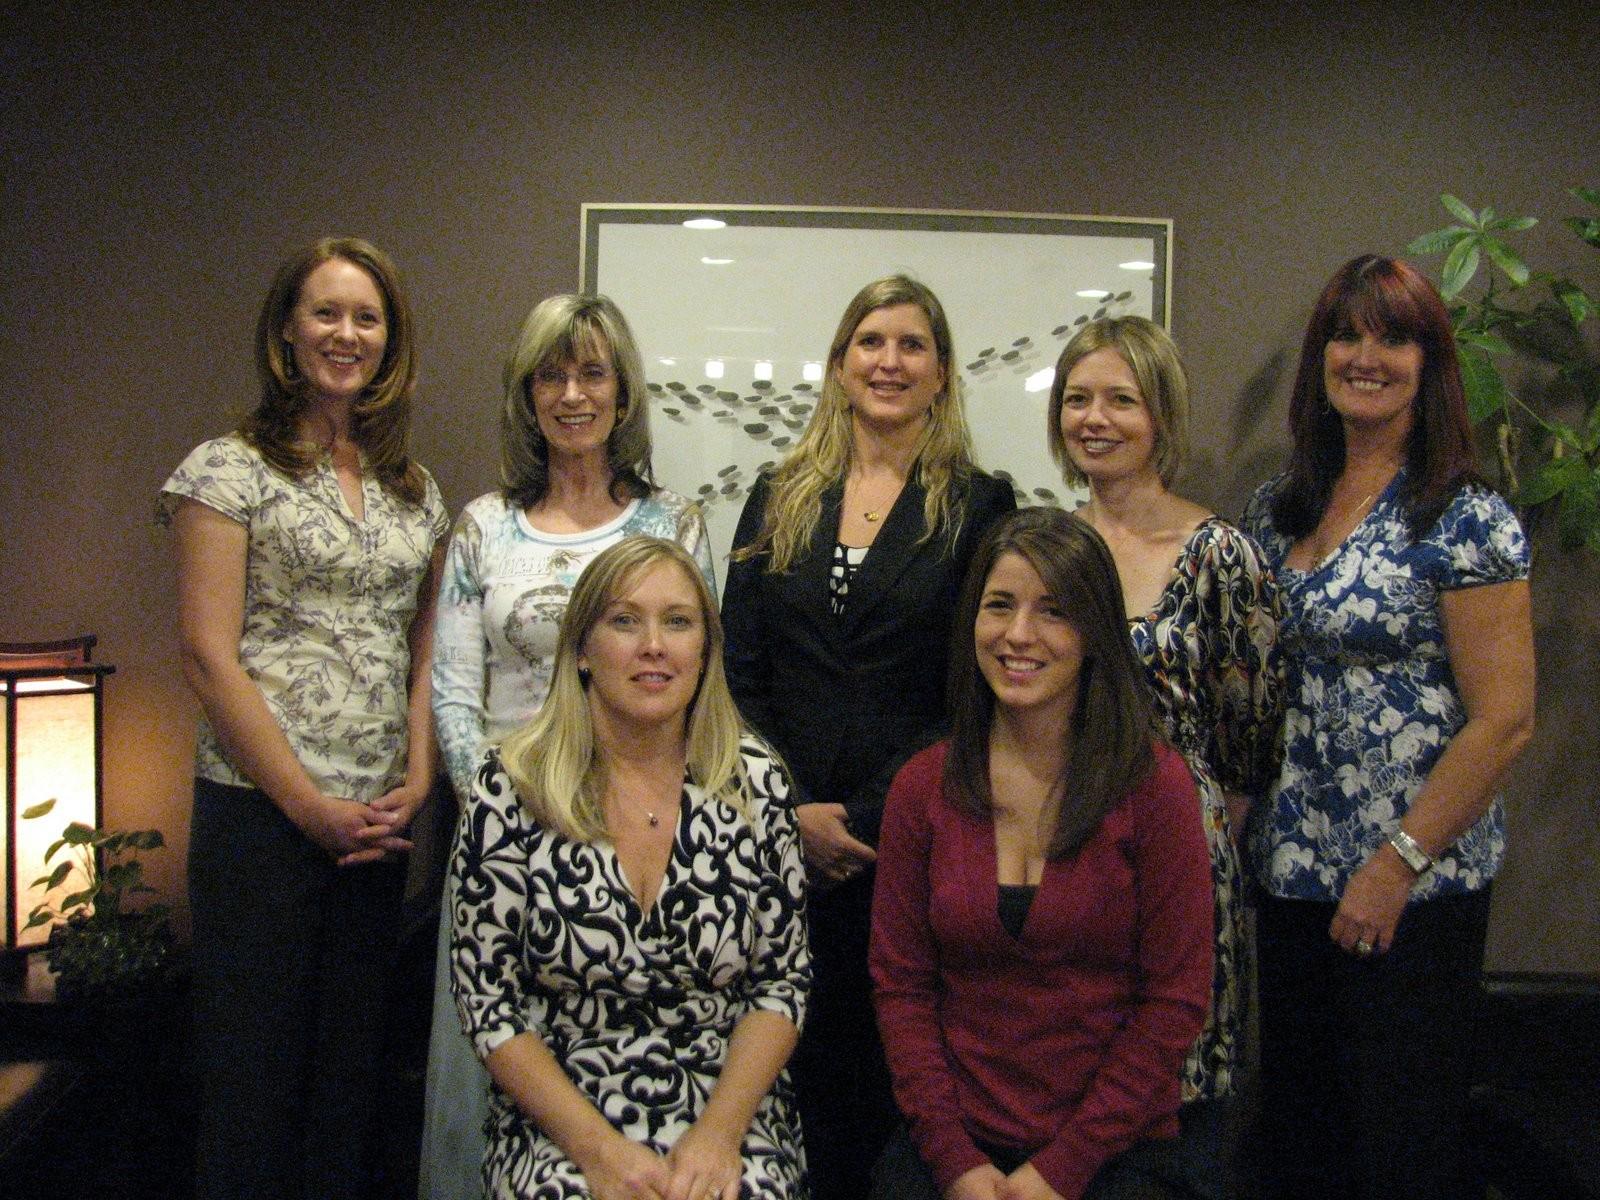 Audrey(massage), Jan(nutrition), Dana(Chinese medicine), Sherri(Chinese medicine), Marion(Polarity), Lisa(office manager/reception), Ashley(reception)